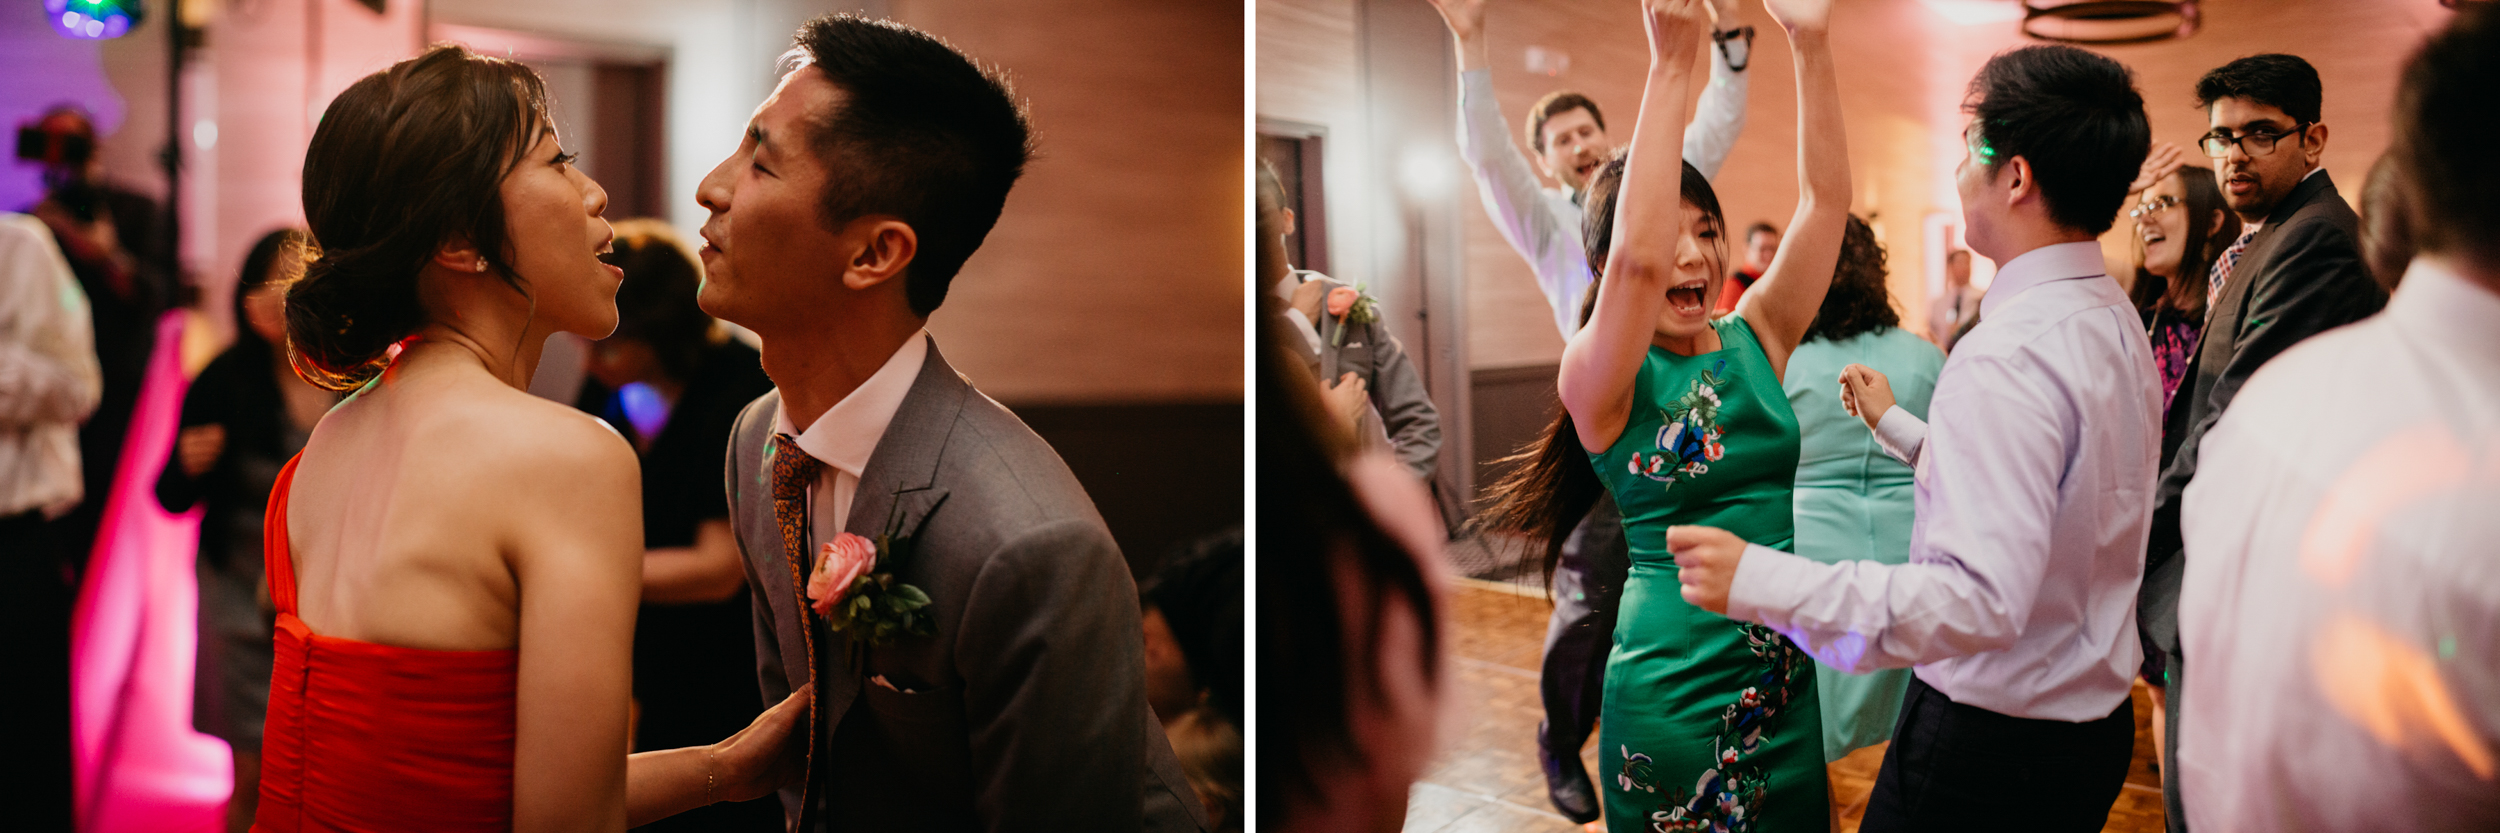 Mindy_Bo_Boston_Wedding_MIT_HotelCommonwealth_032.jpg